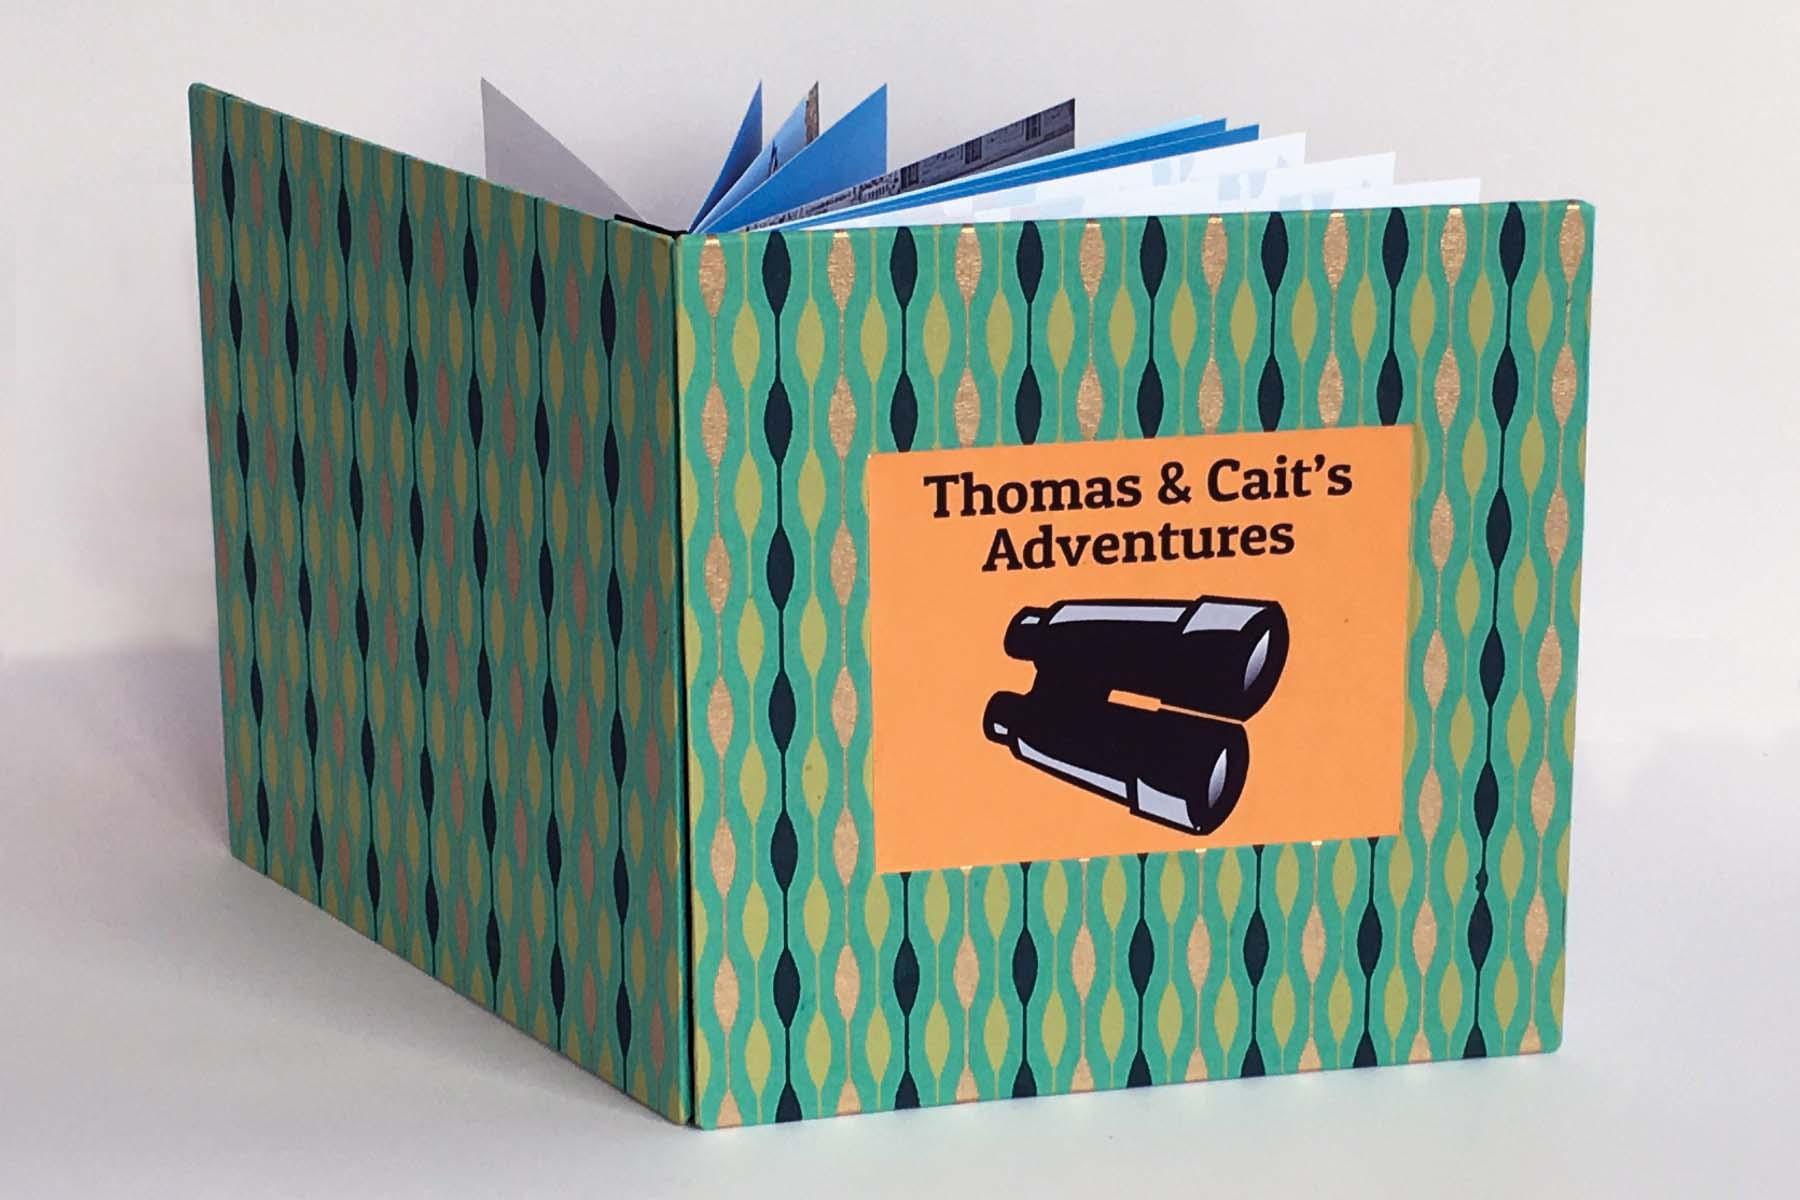 Thomas & Cait's Adventures